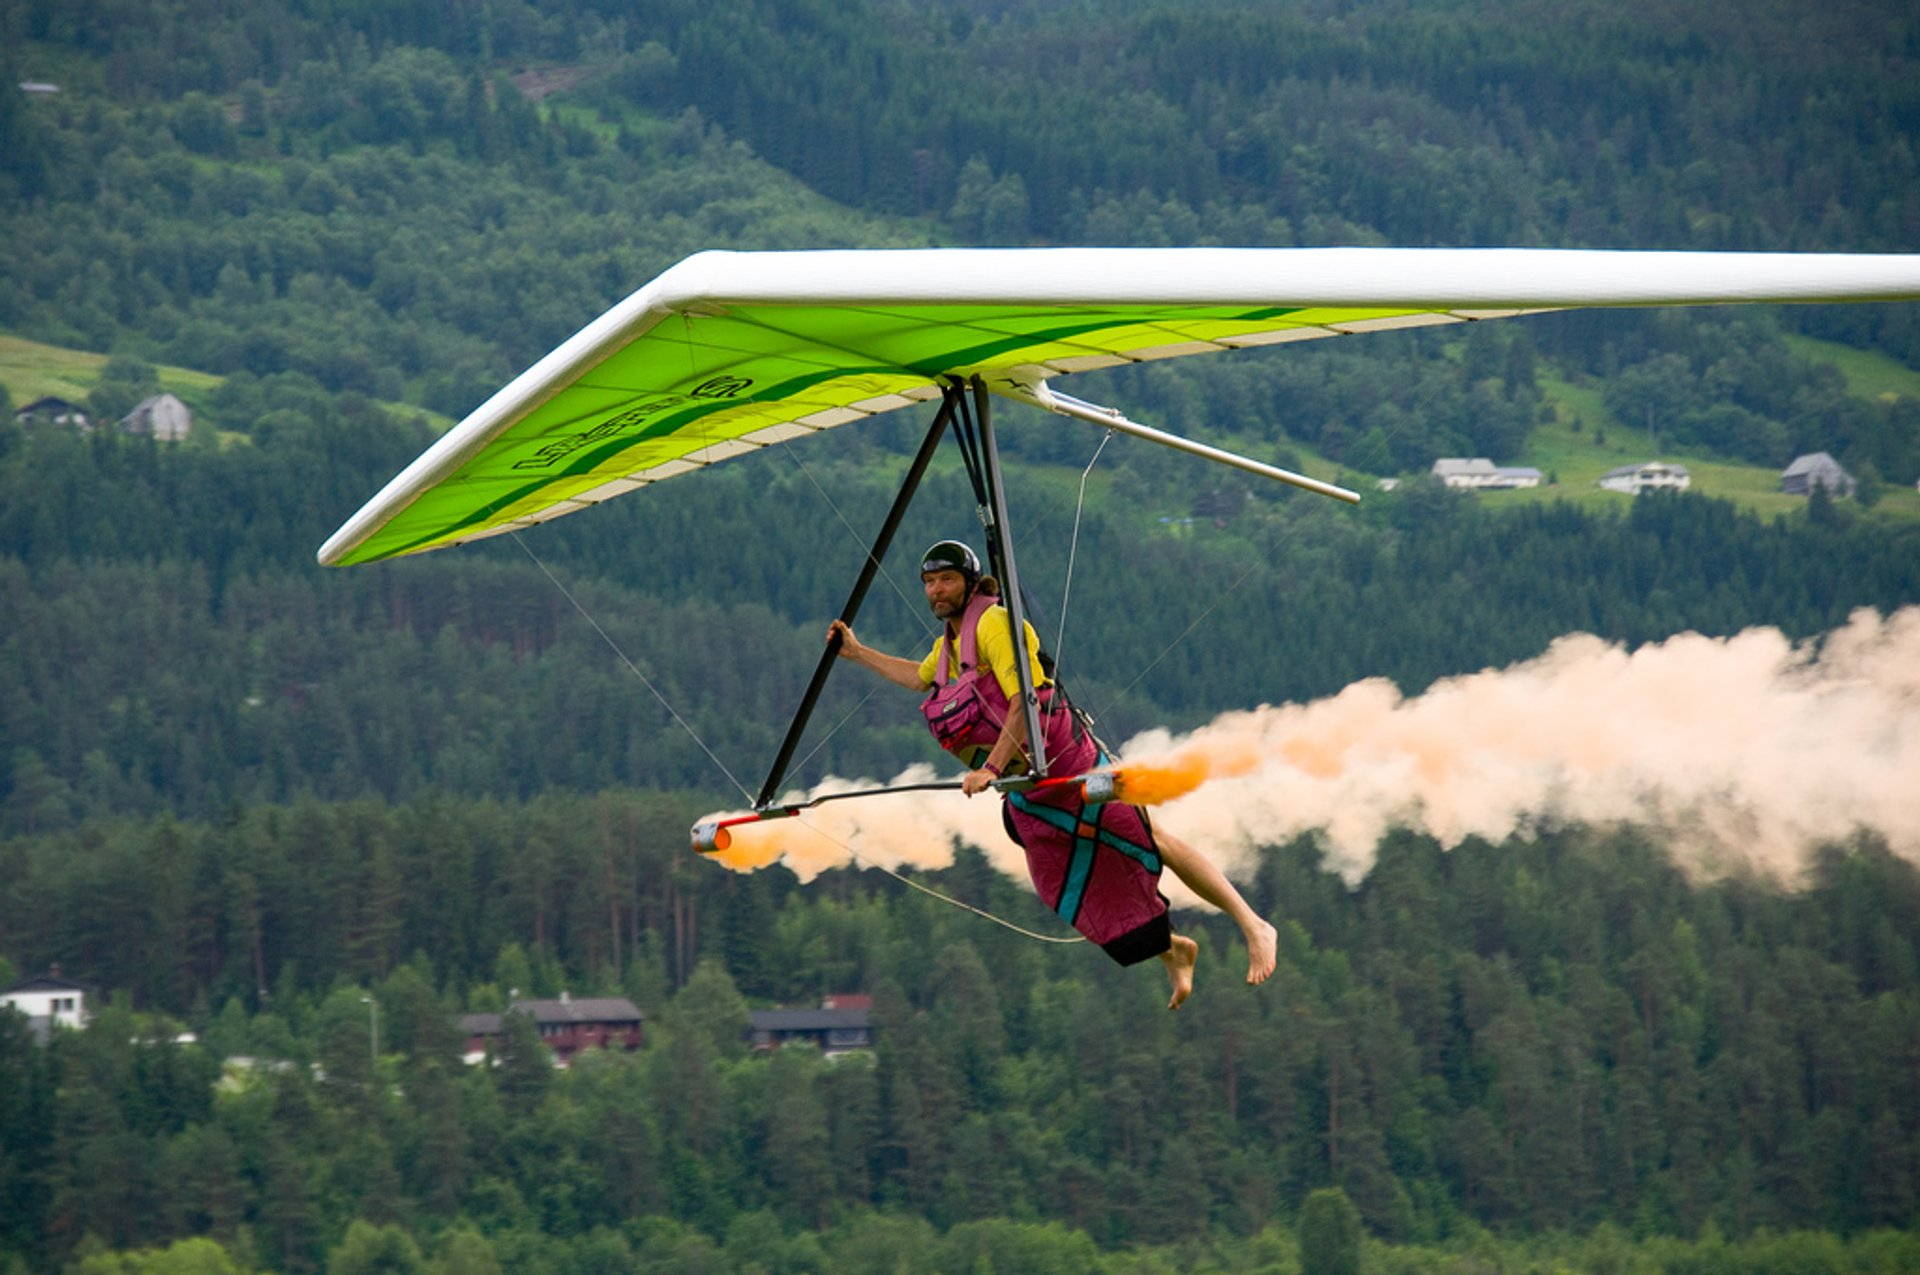 Ekstremsportveko in Norway 2020 - Best Time